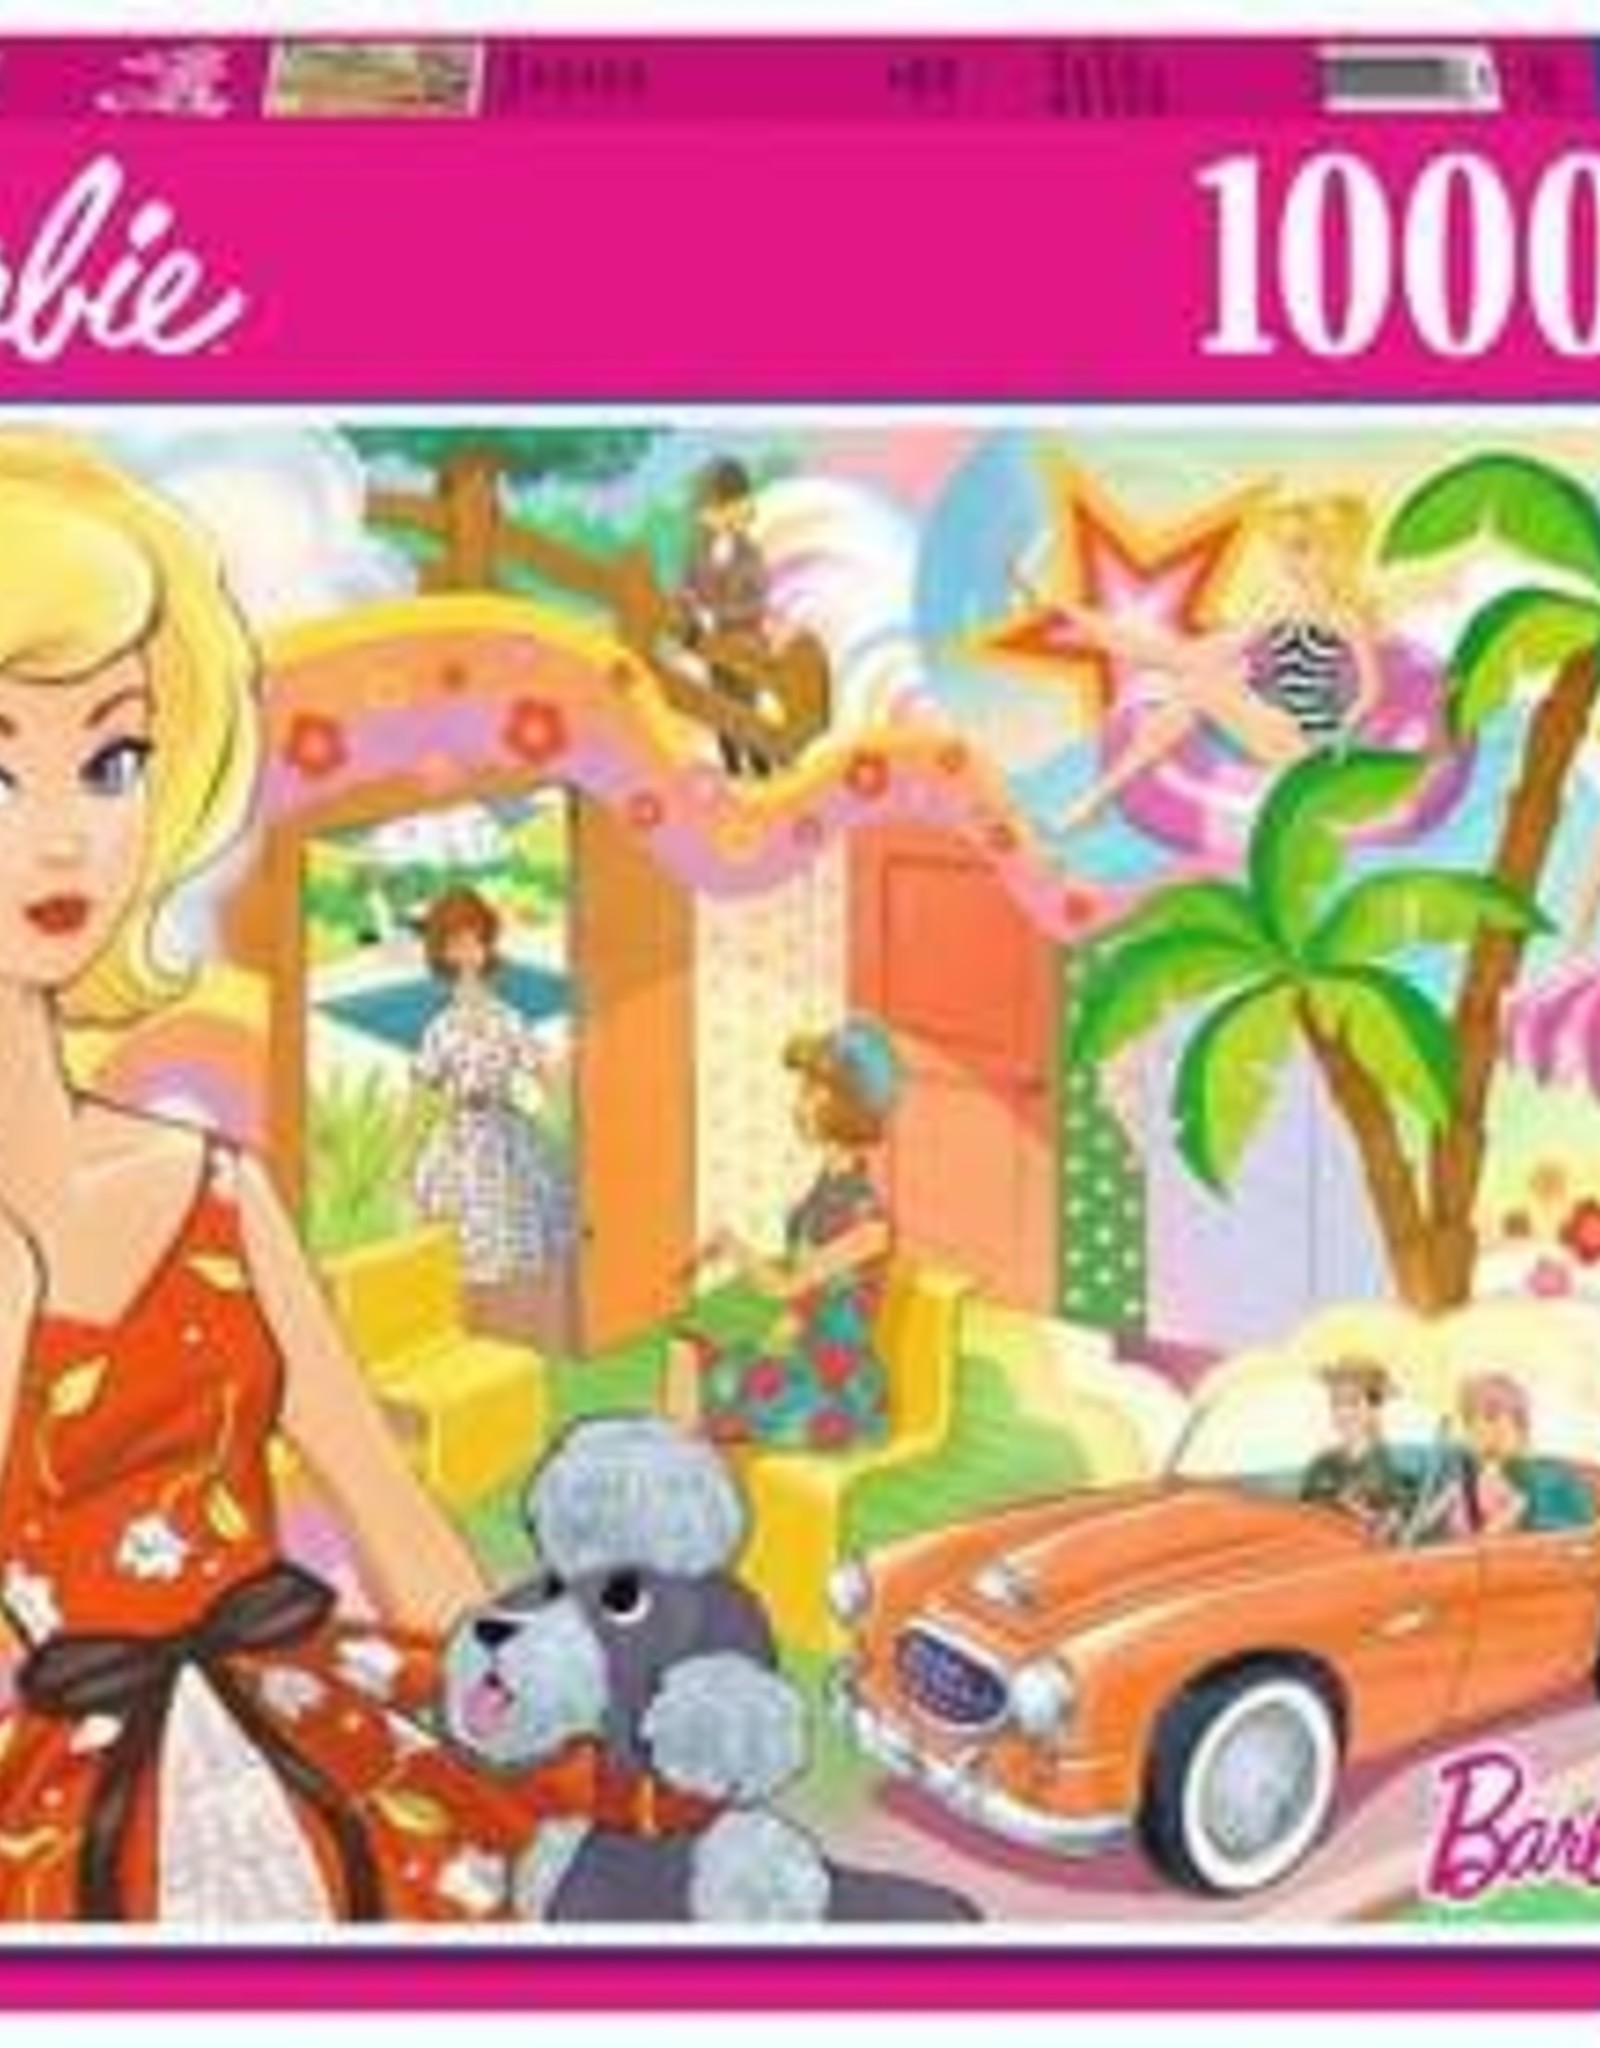 Ravensburger 1000 pc Vintage Barbie